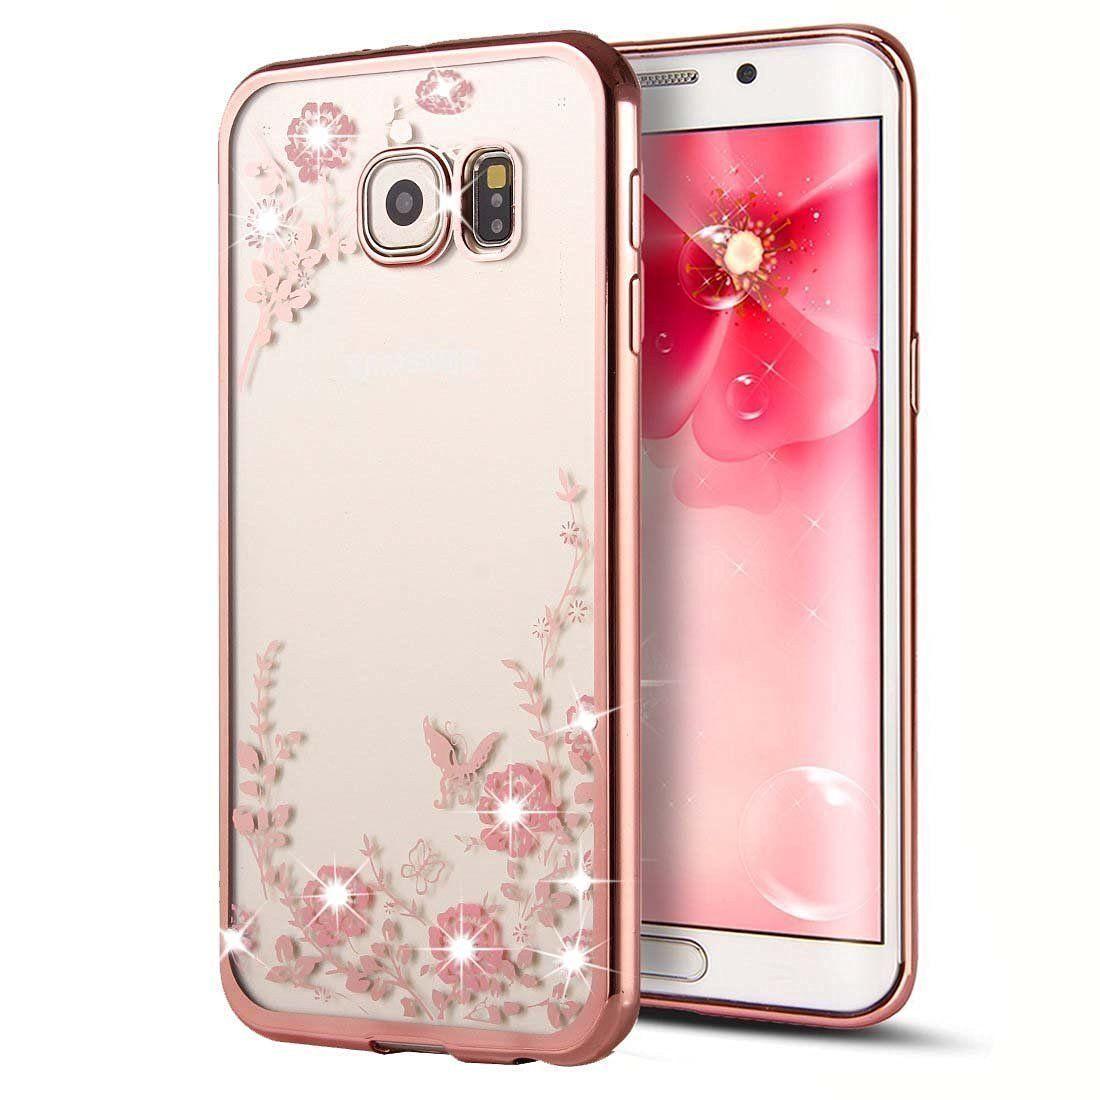 Samsung Galaxy S7 Edge Case Inspirationc Secret Garden Rose Gold And White Tpu Pl Samsung Galaxy S7 Edge Cases Samsung Galaxy J7 Case Samsung Galaxy S7 Edge